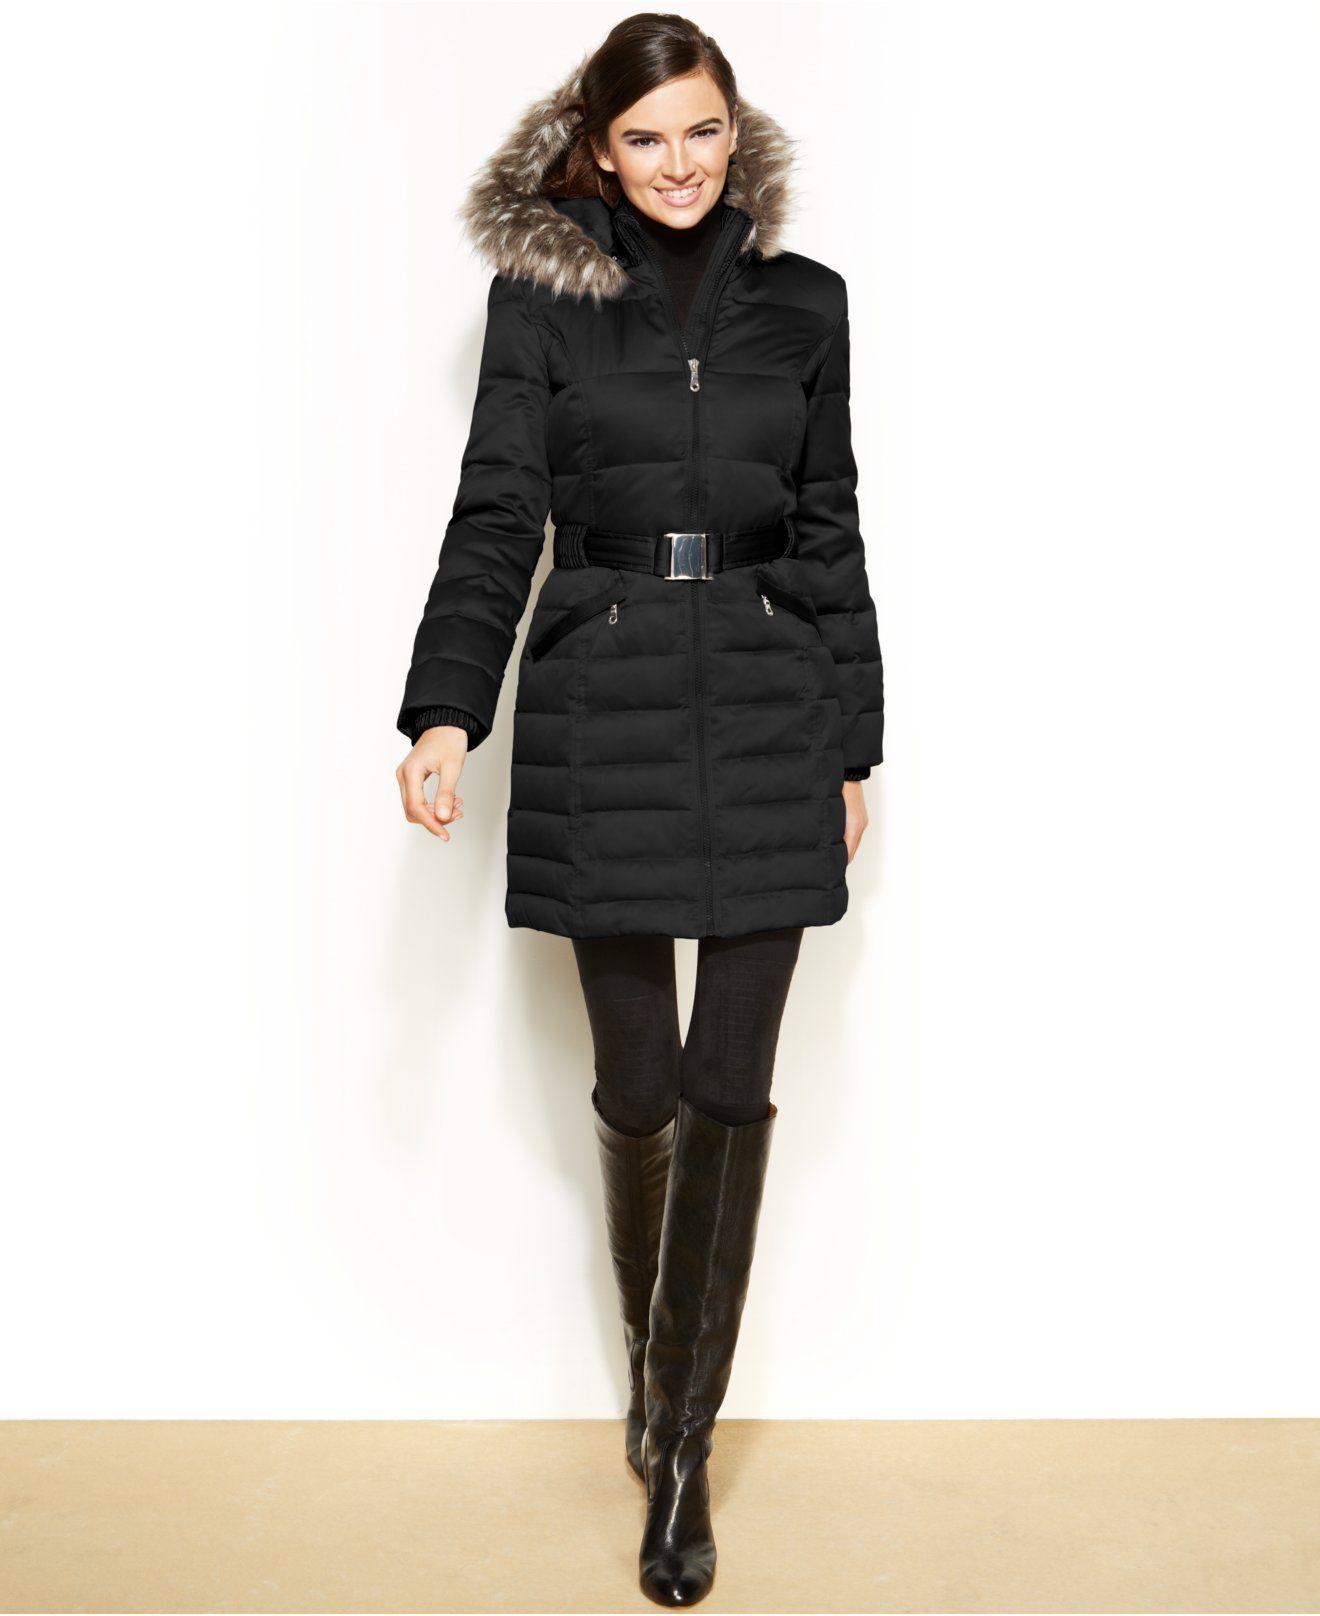 Dkny Hooded Faux Fur Trim Belted Down Puffer Coat Coats Women Macys Black M Down Puffer Coat Puffer Coat Coats For Women [ 1616 x 1320 Pixel ]